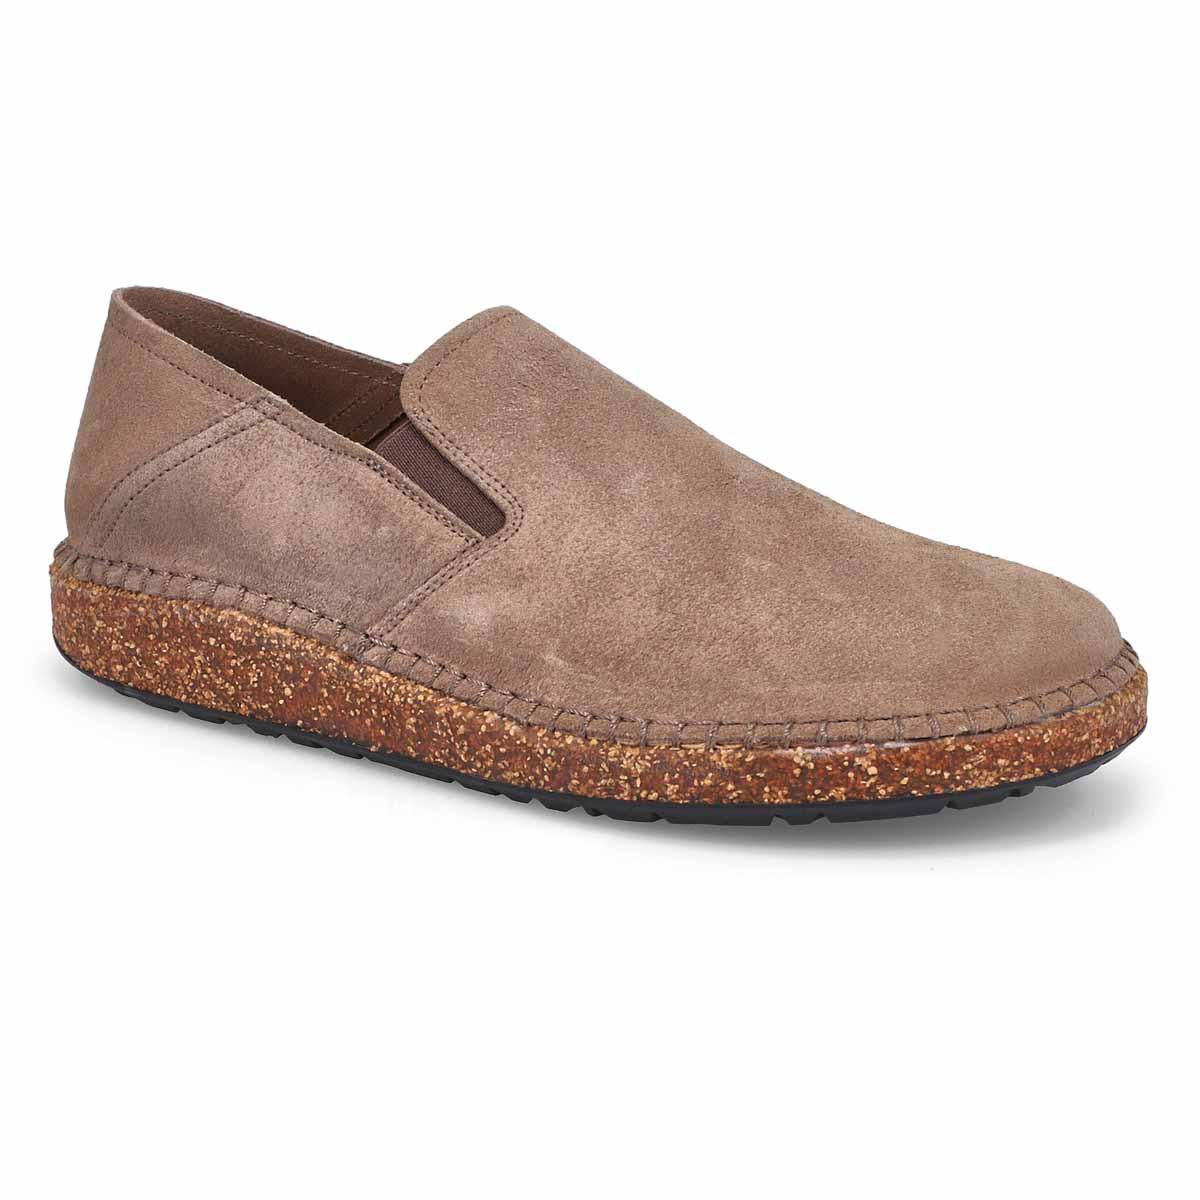 Women's Callen Slip On Shoe - Gray Taupe/Narrow